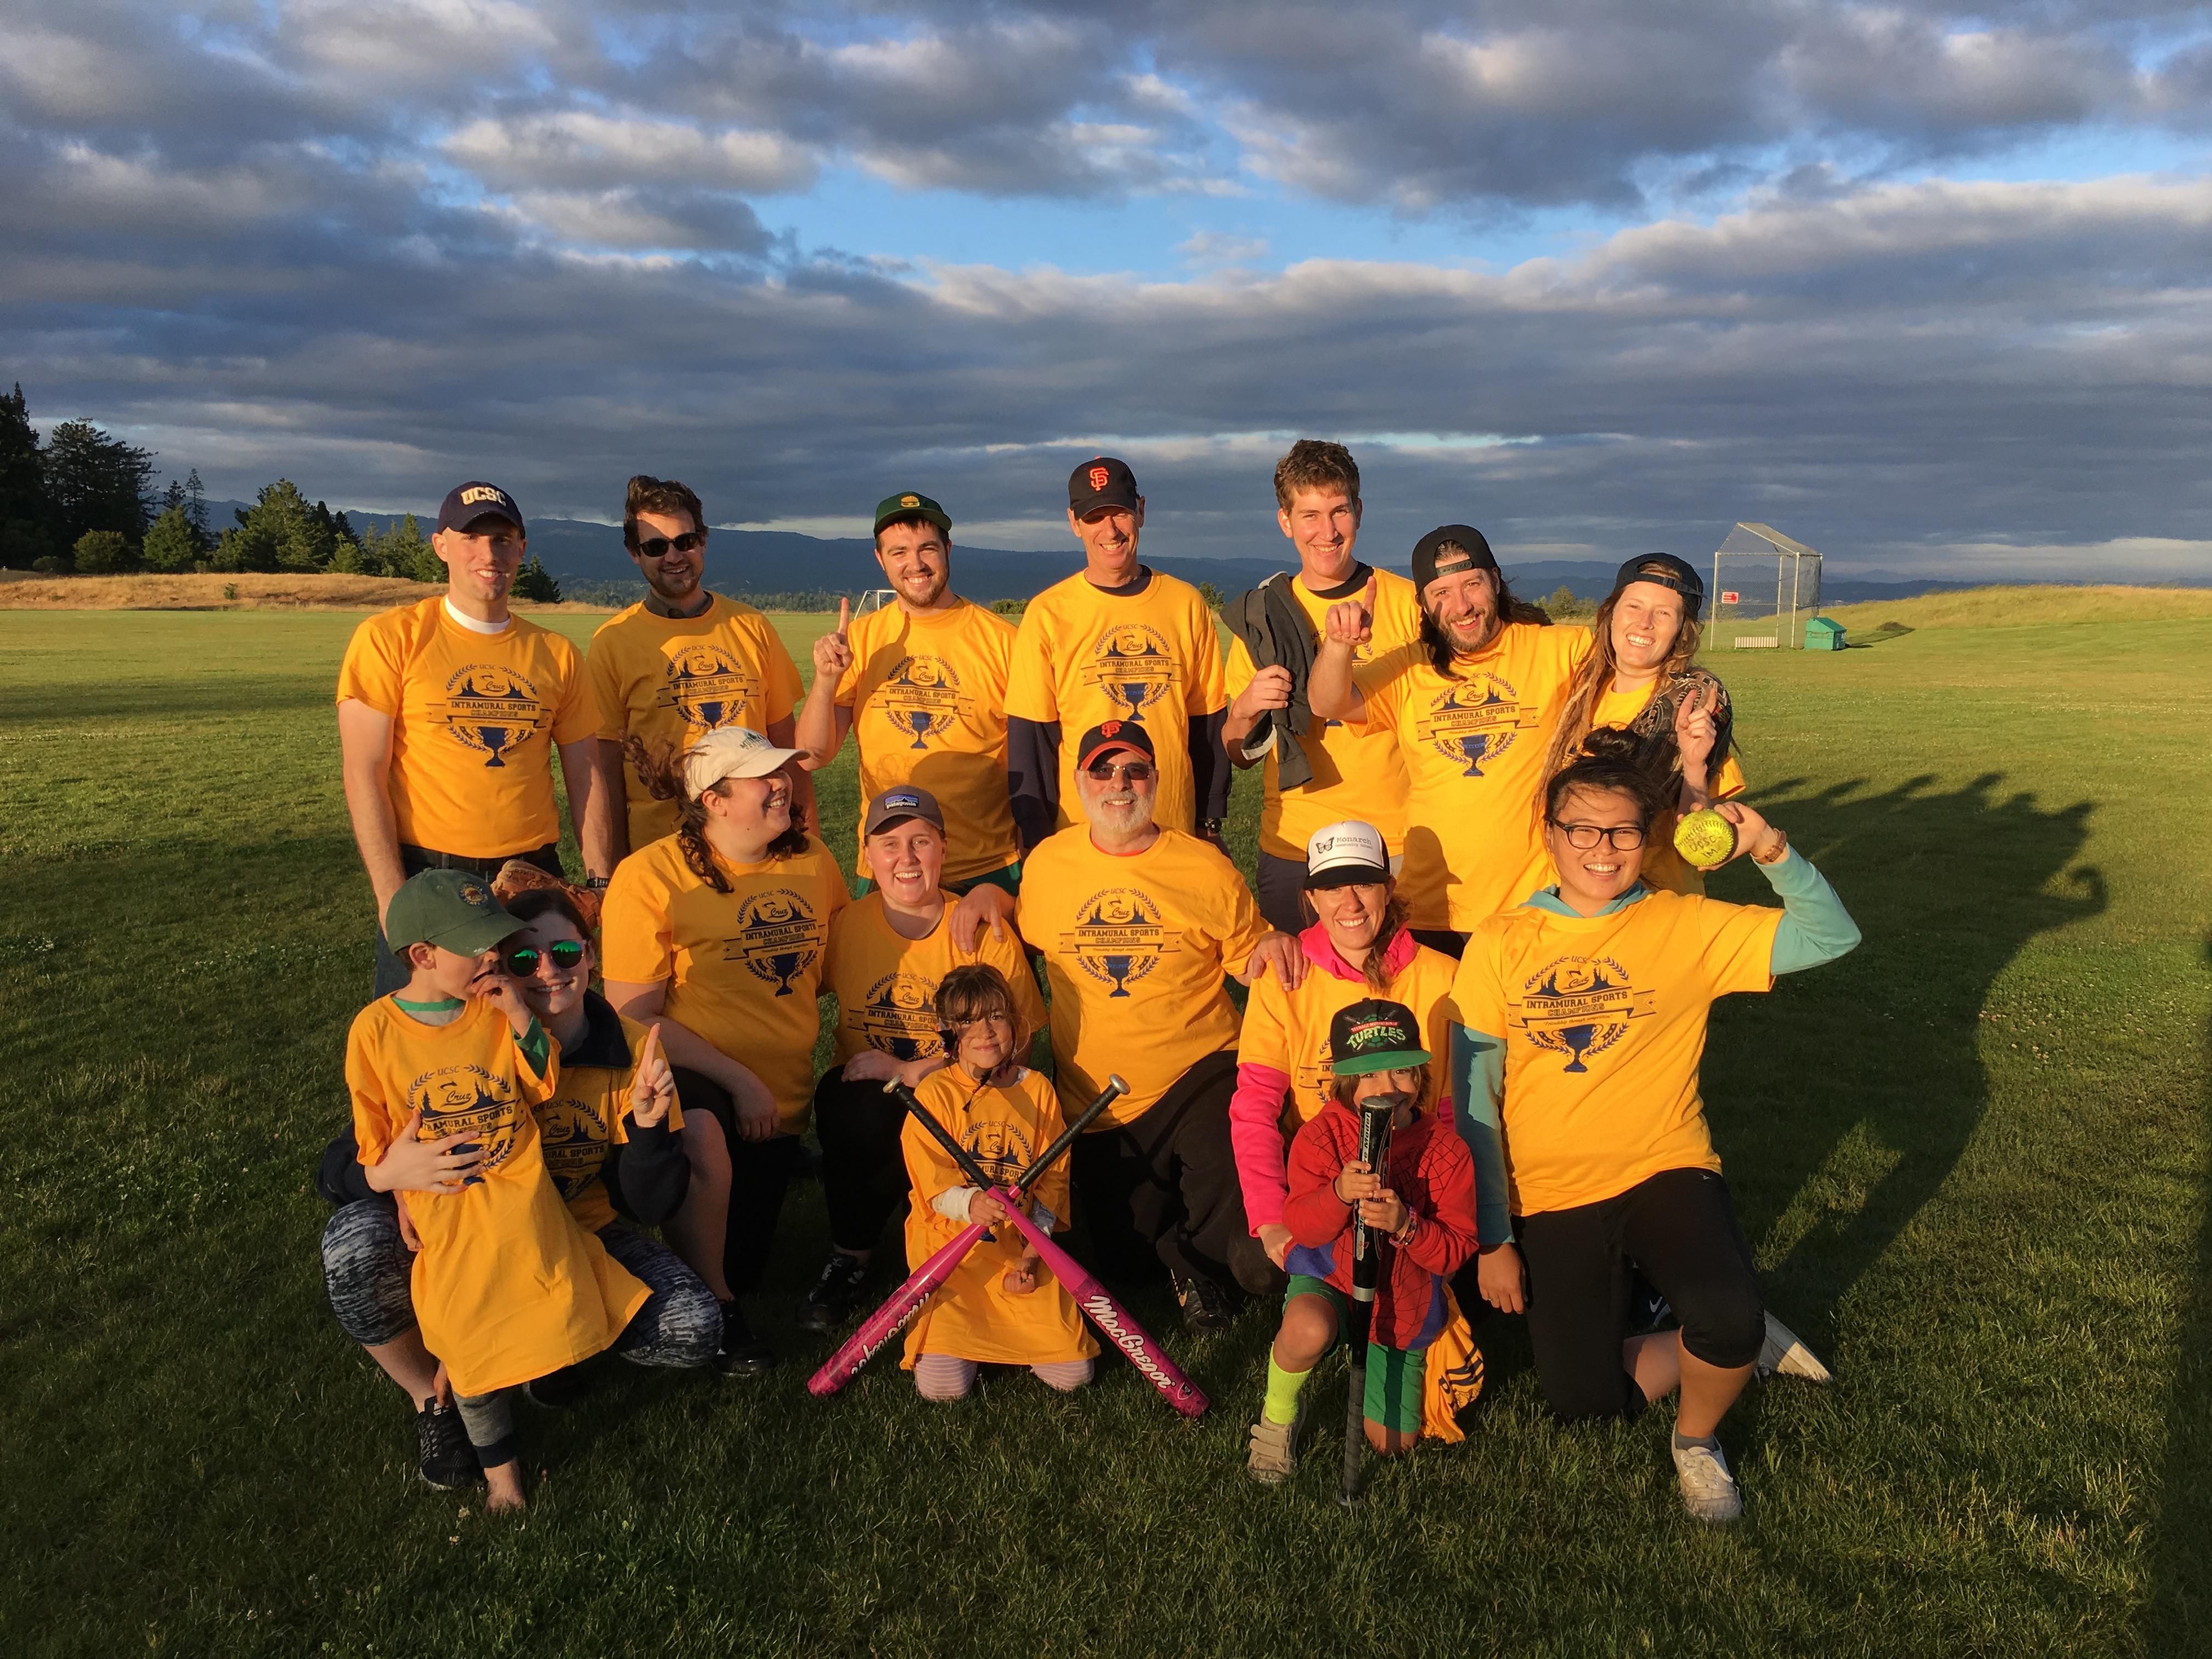 Spring 2017 Coed Softball Team